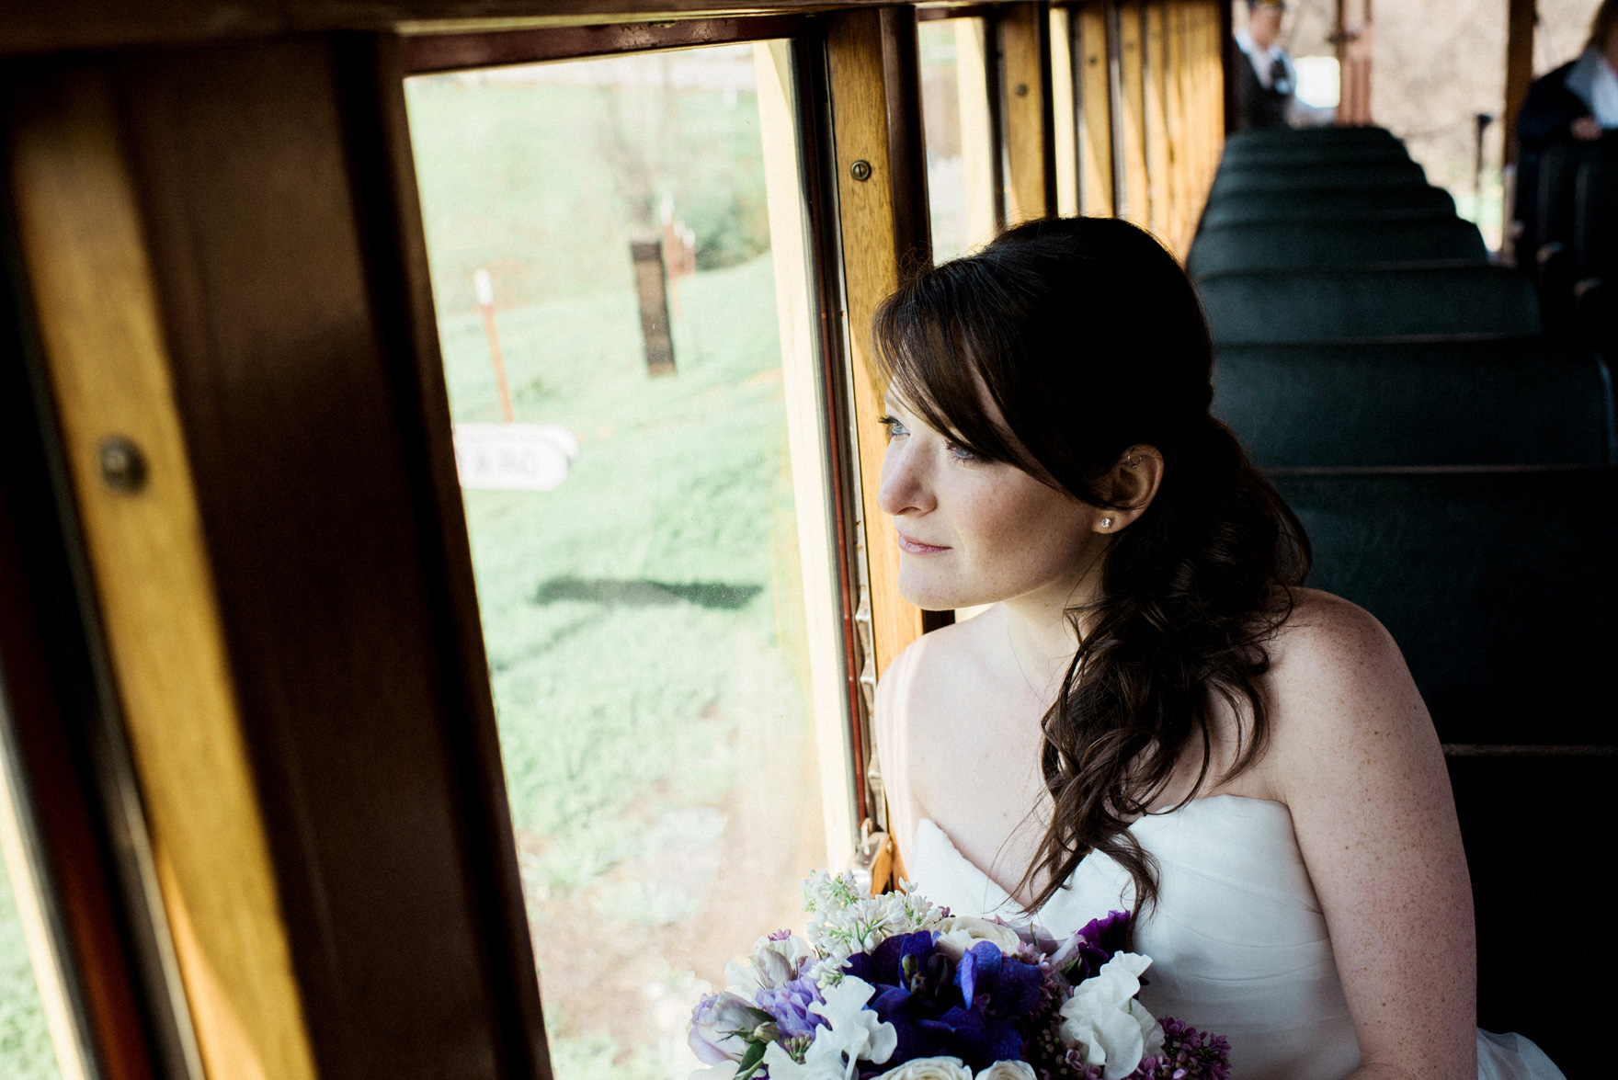 California-Santa-Margarita-Ranch-destination--Saint-Louis-Obispo-wedding-photographer-christina-lilly-photography035